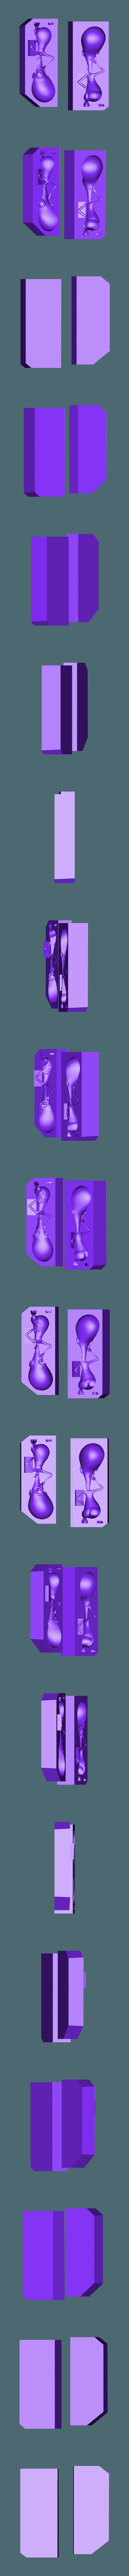 moldversion2.stl Download free STL file roger mold. american dad • 3D printing model, gaaraa